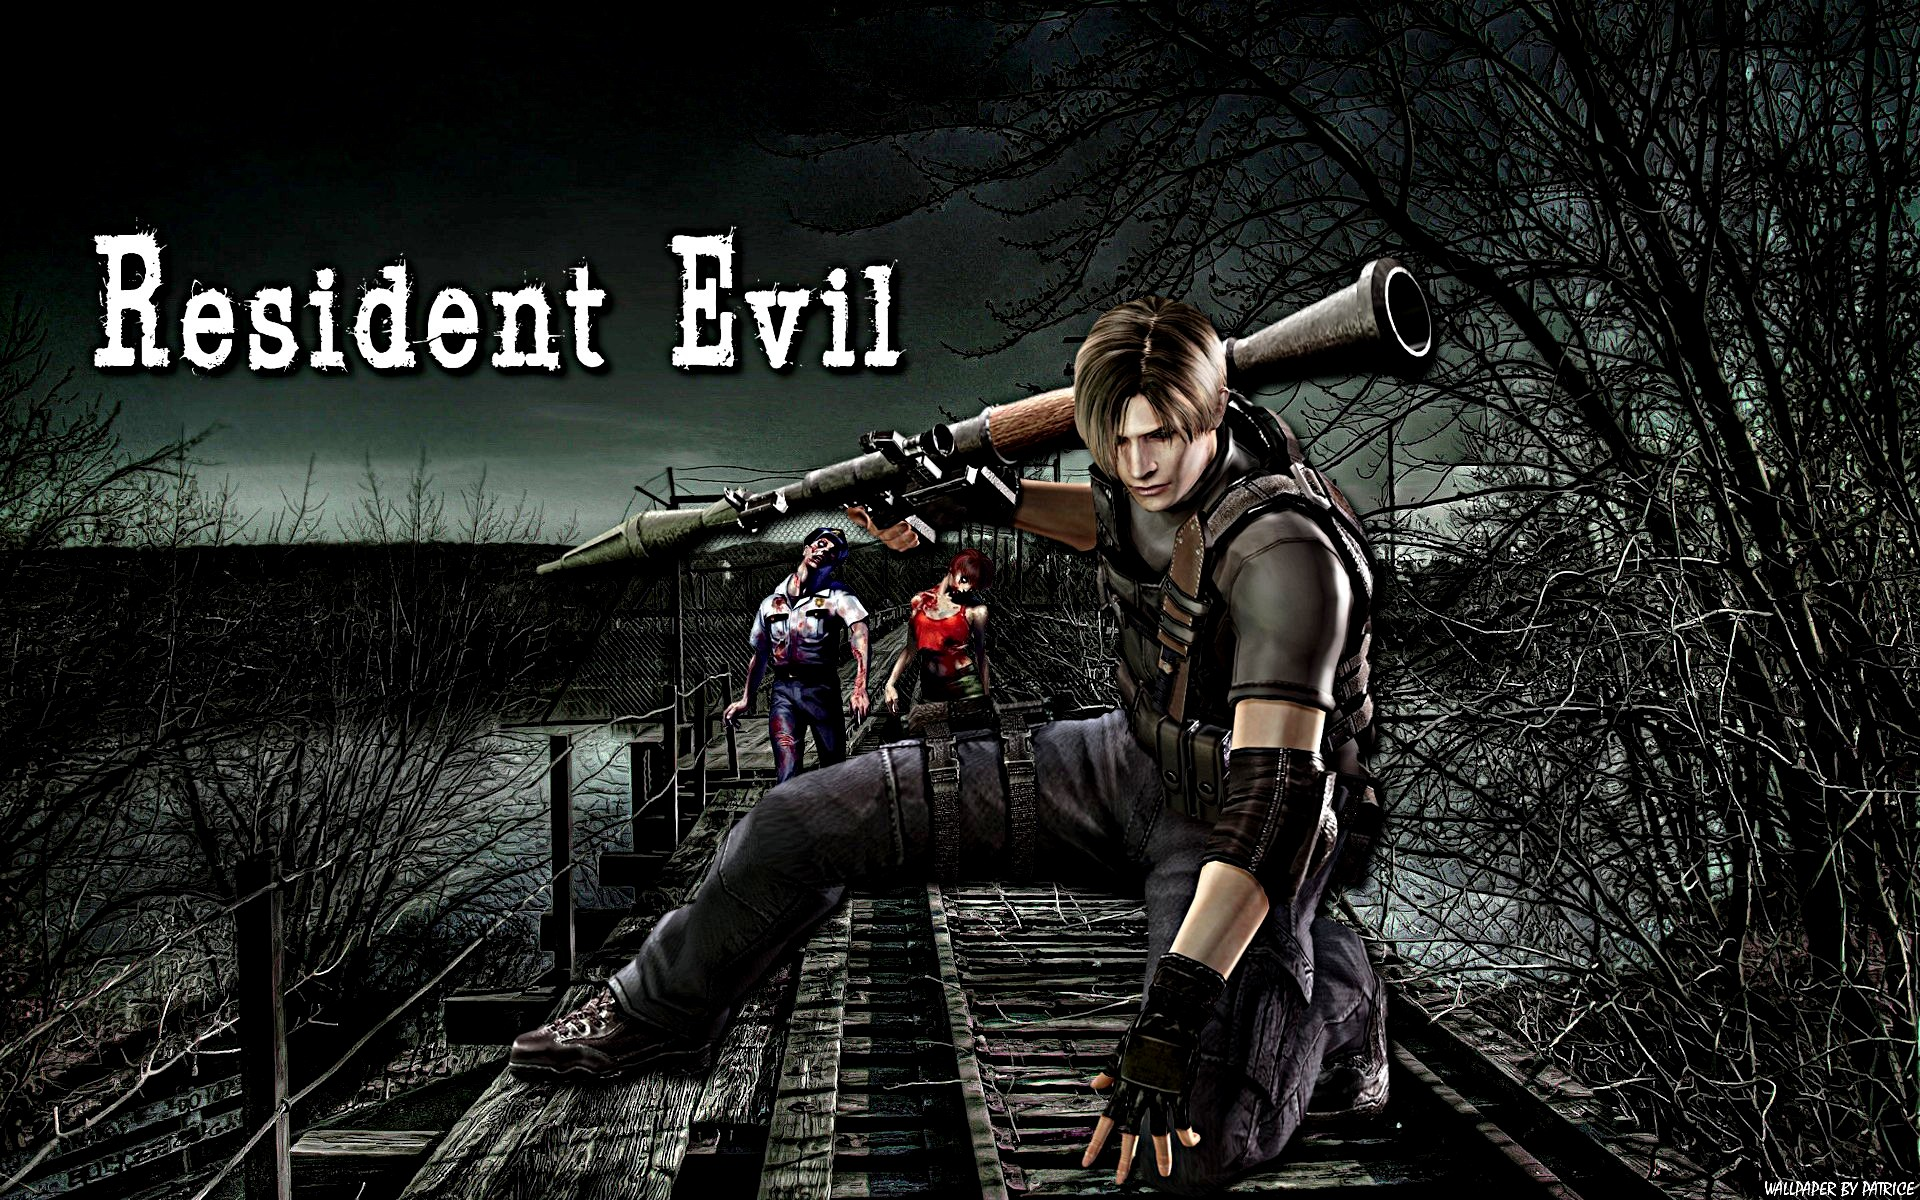 49 Resident Evil Wallpapers Free Download On Wallpapersafari